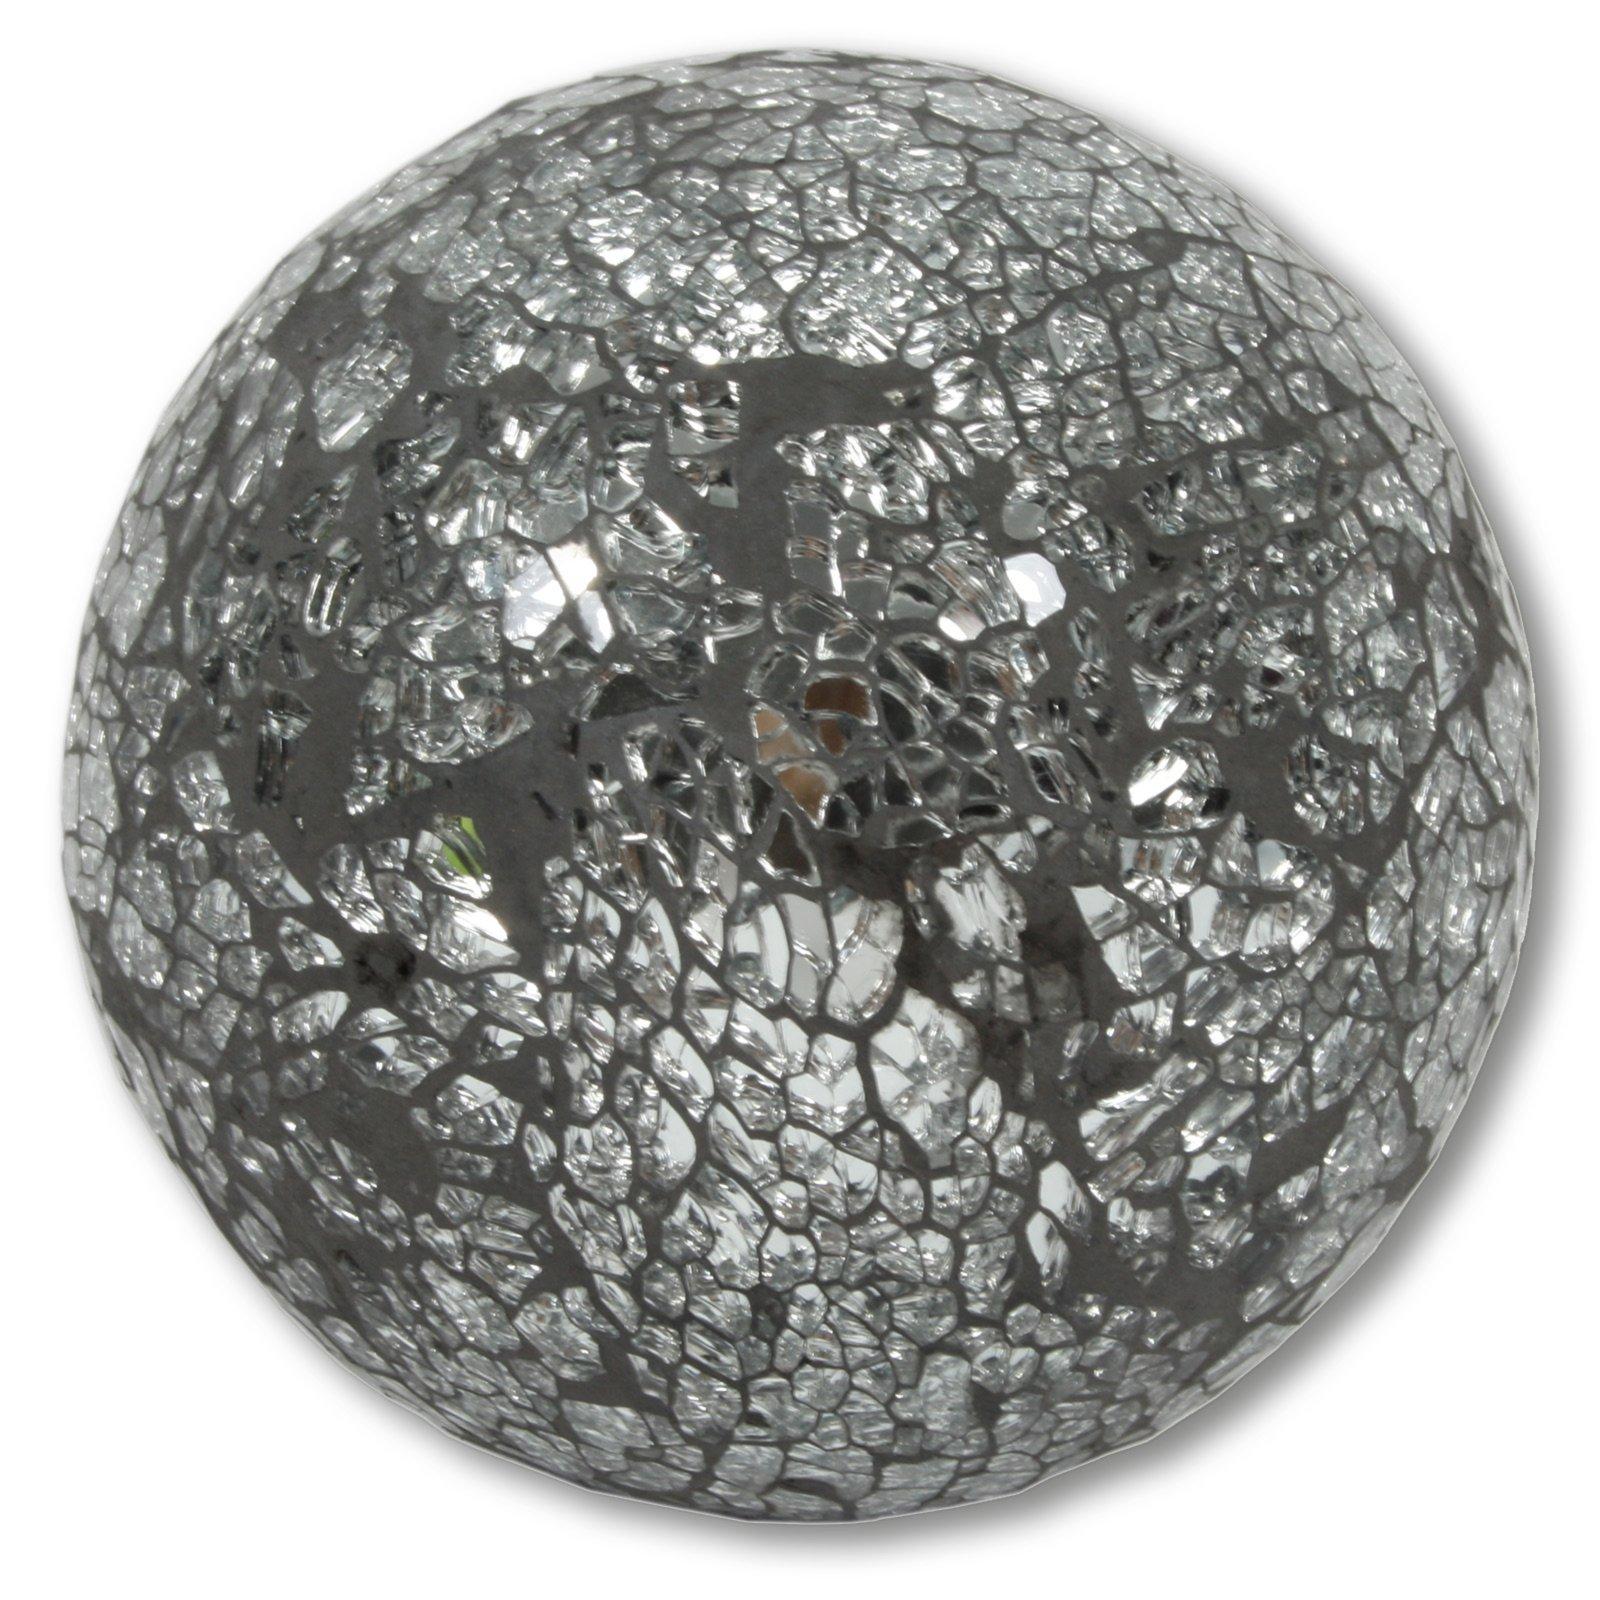 Deko-Kugel - silber - Mosaik - 10 cm Durchmesser